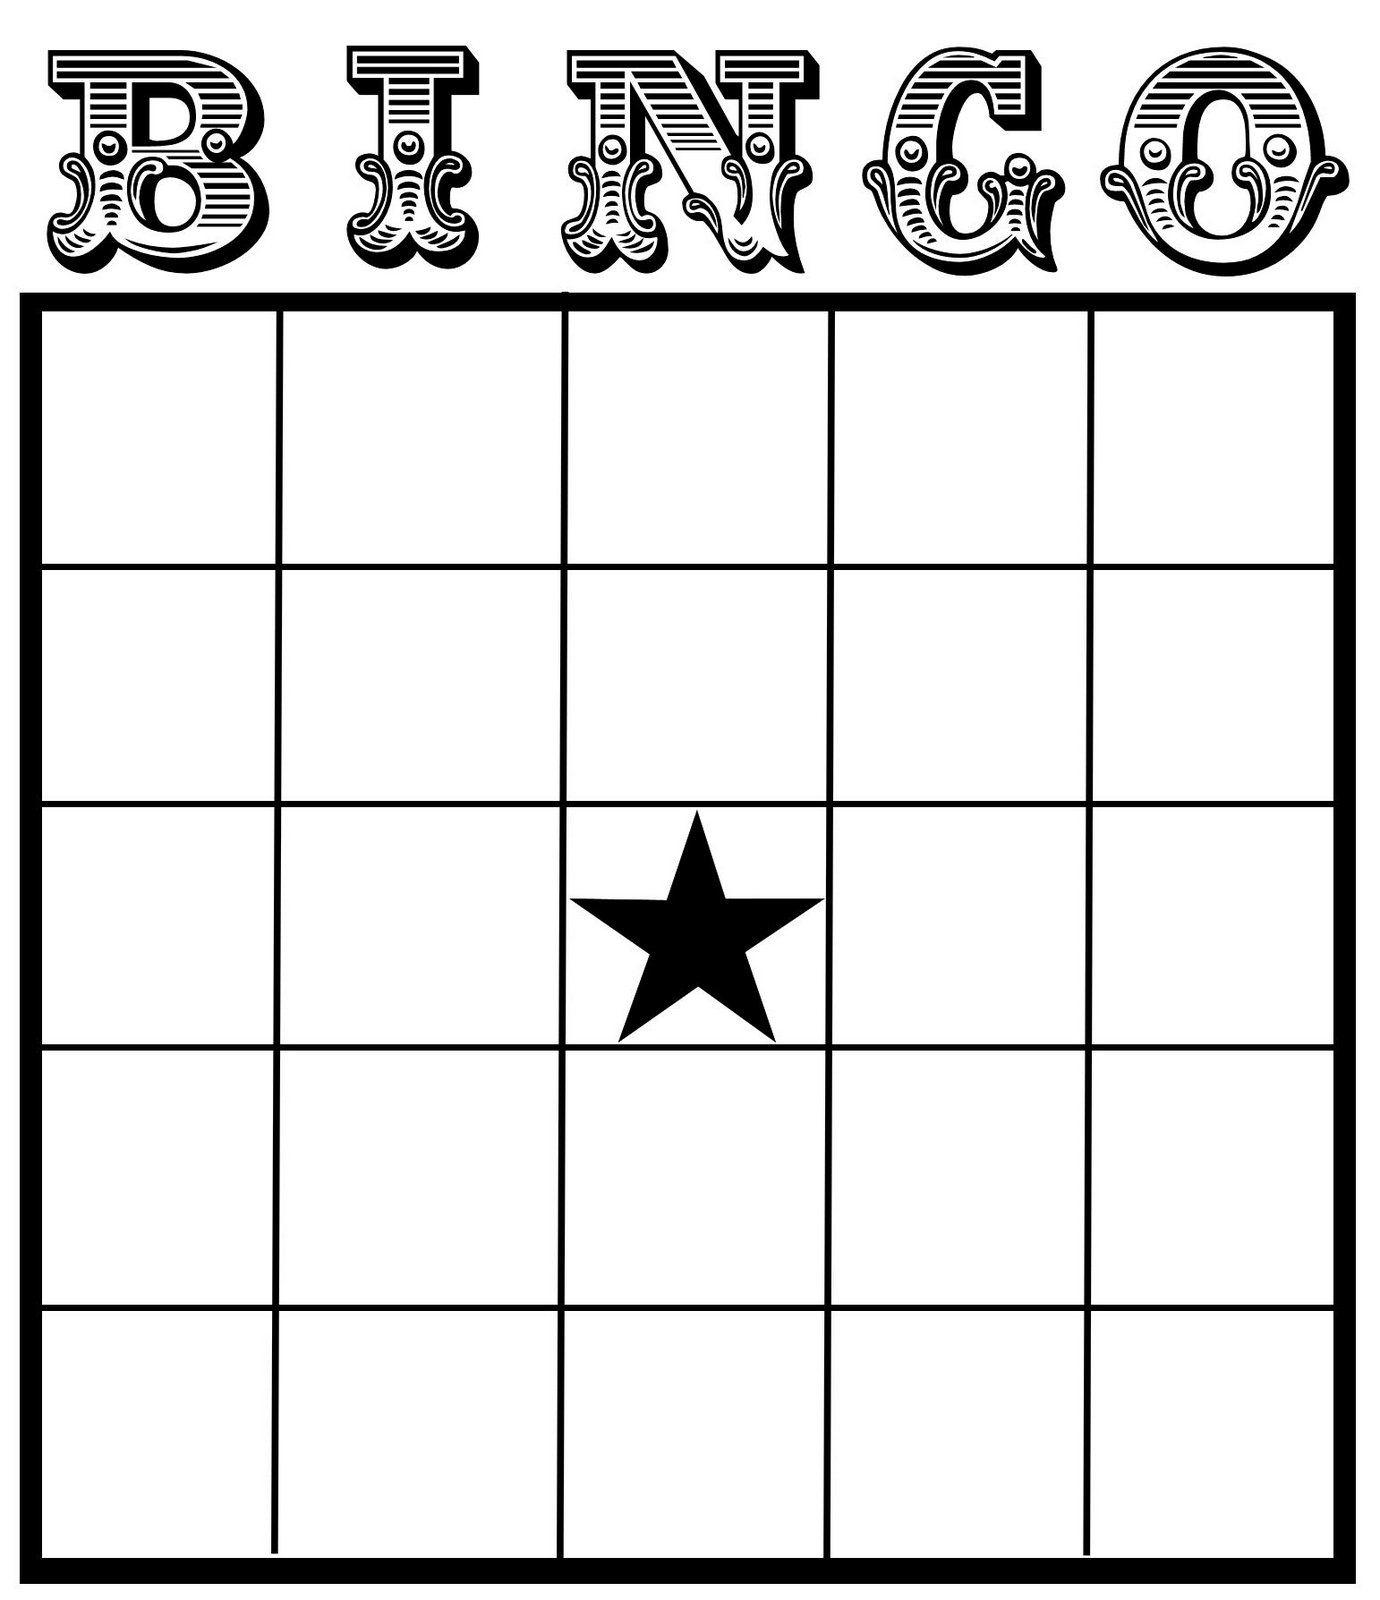 Let's Play Some Roller Derby Bingo! Via /r/rollerderby